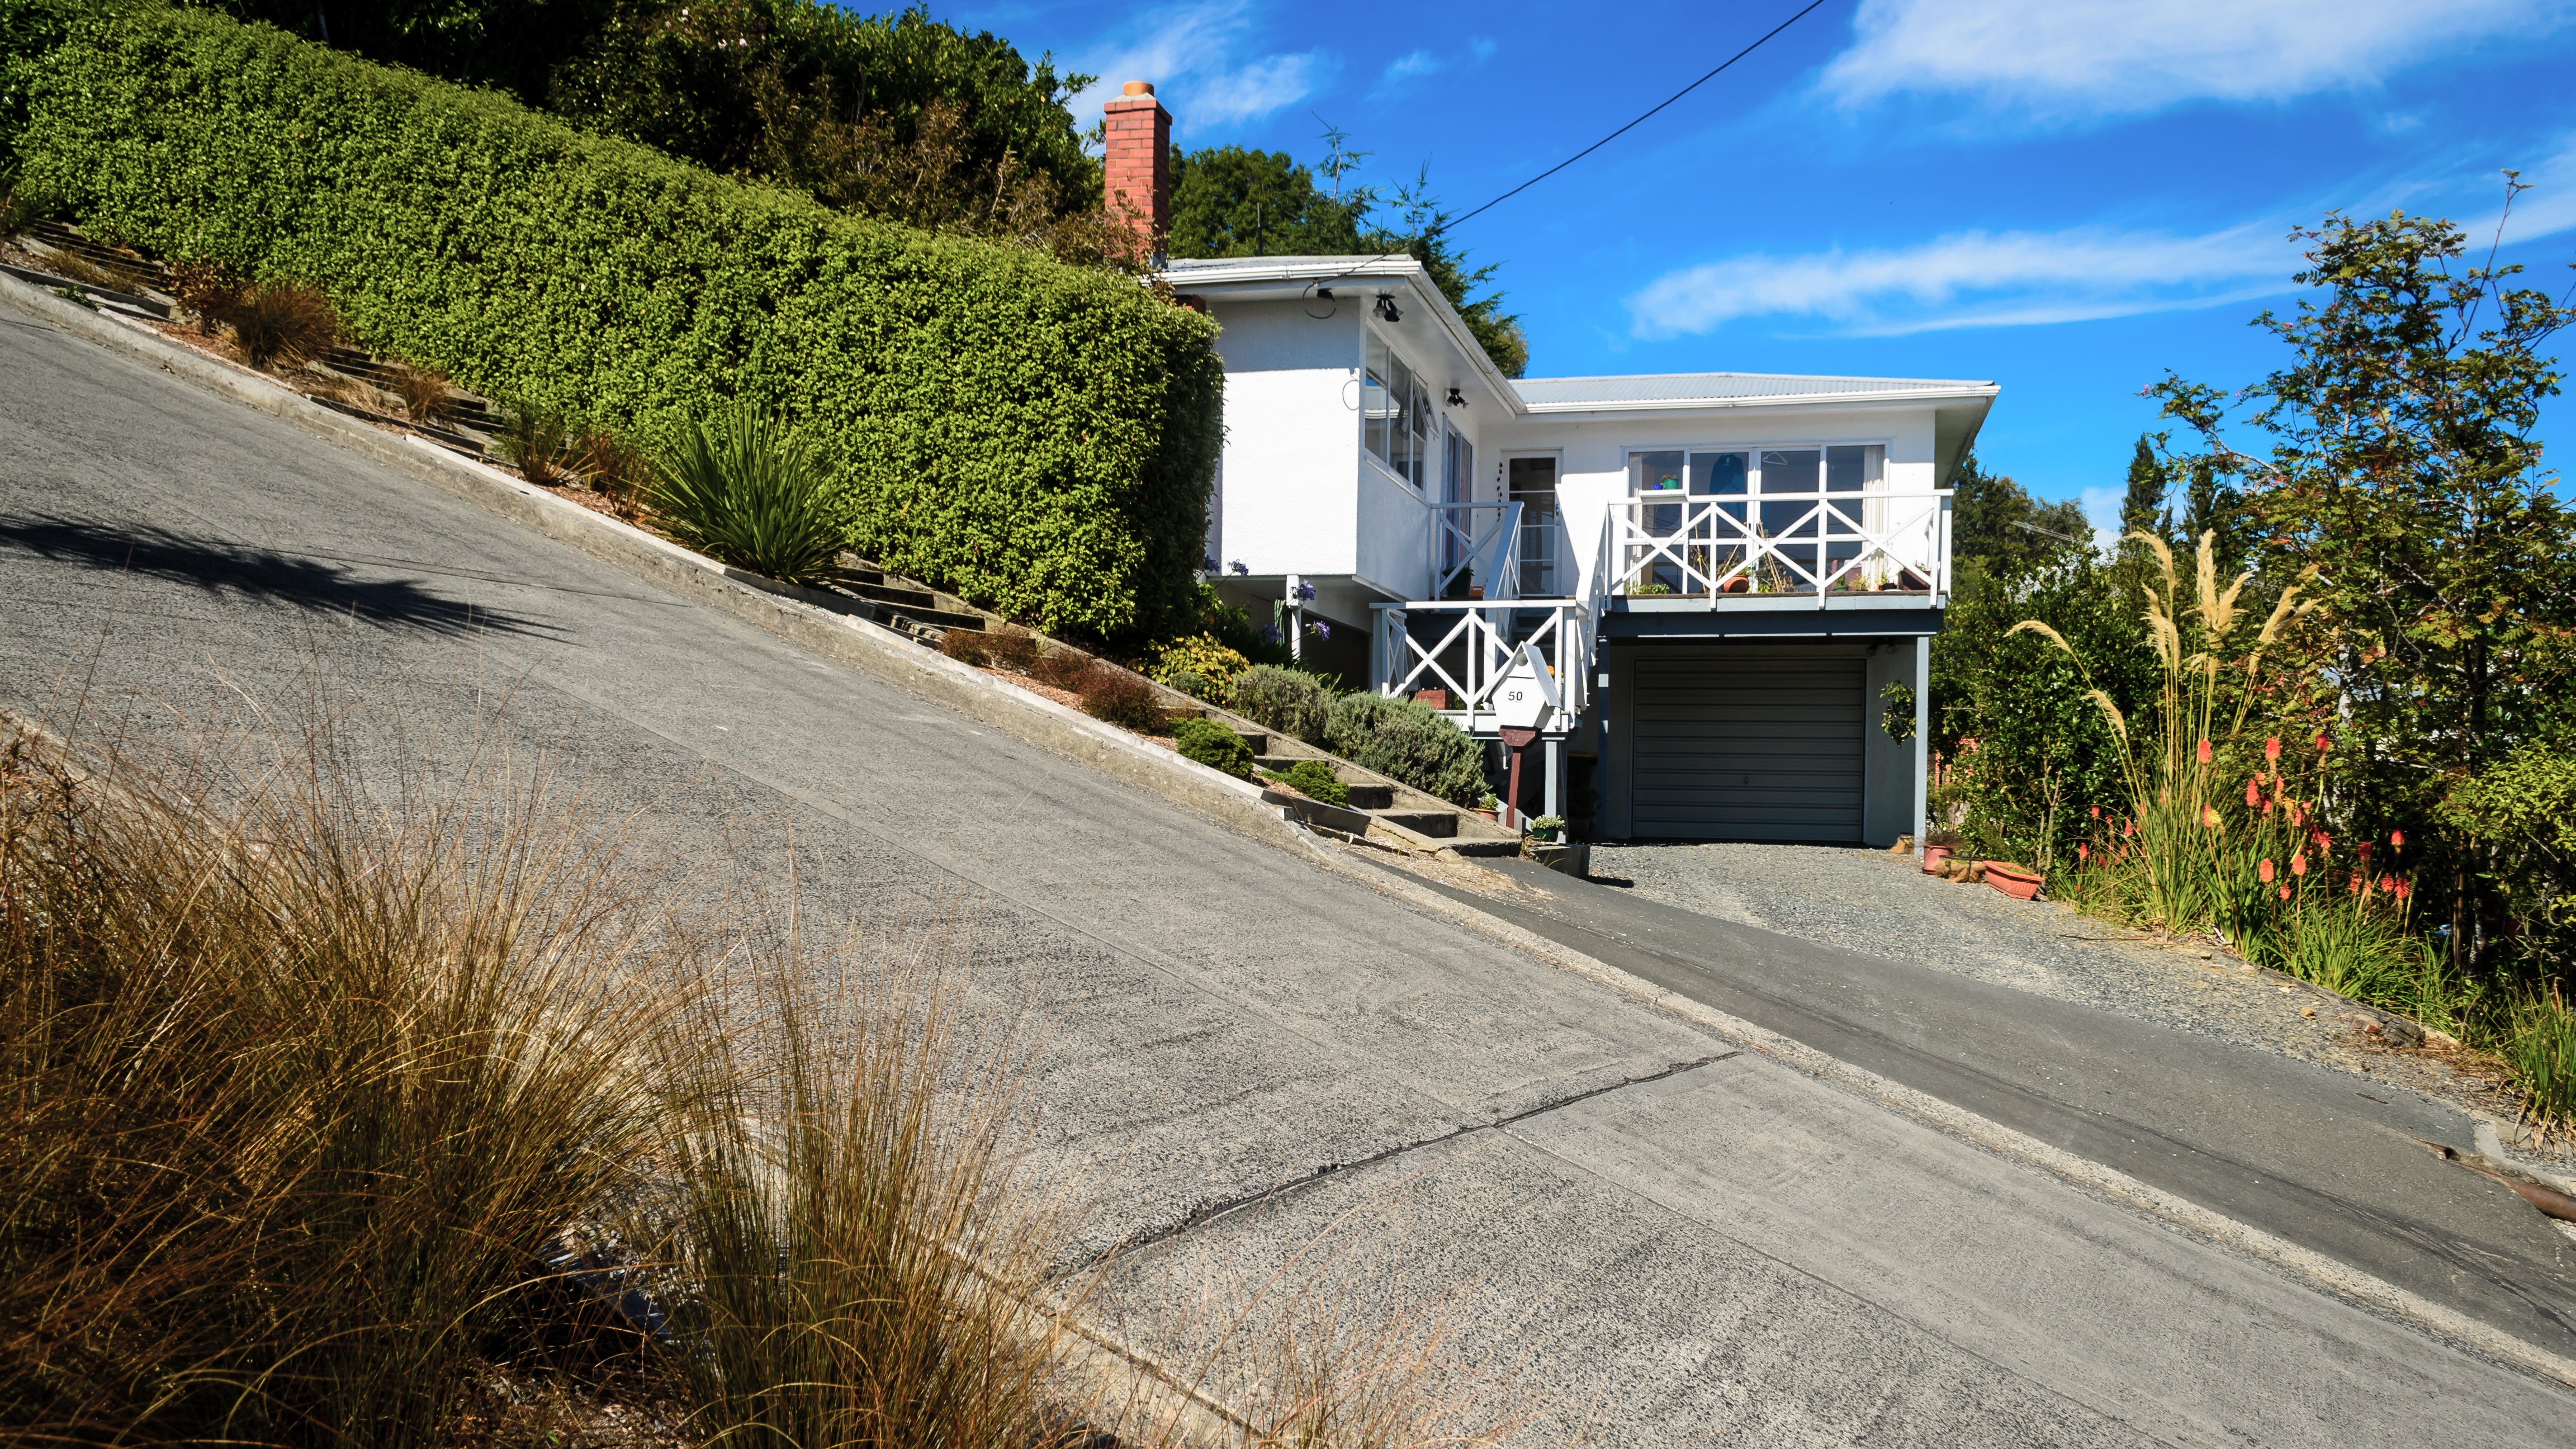 9 best things to do in Dunedin, New Zealand | CNN Travel